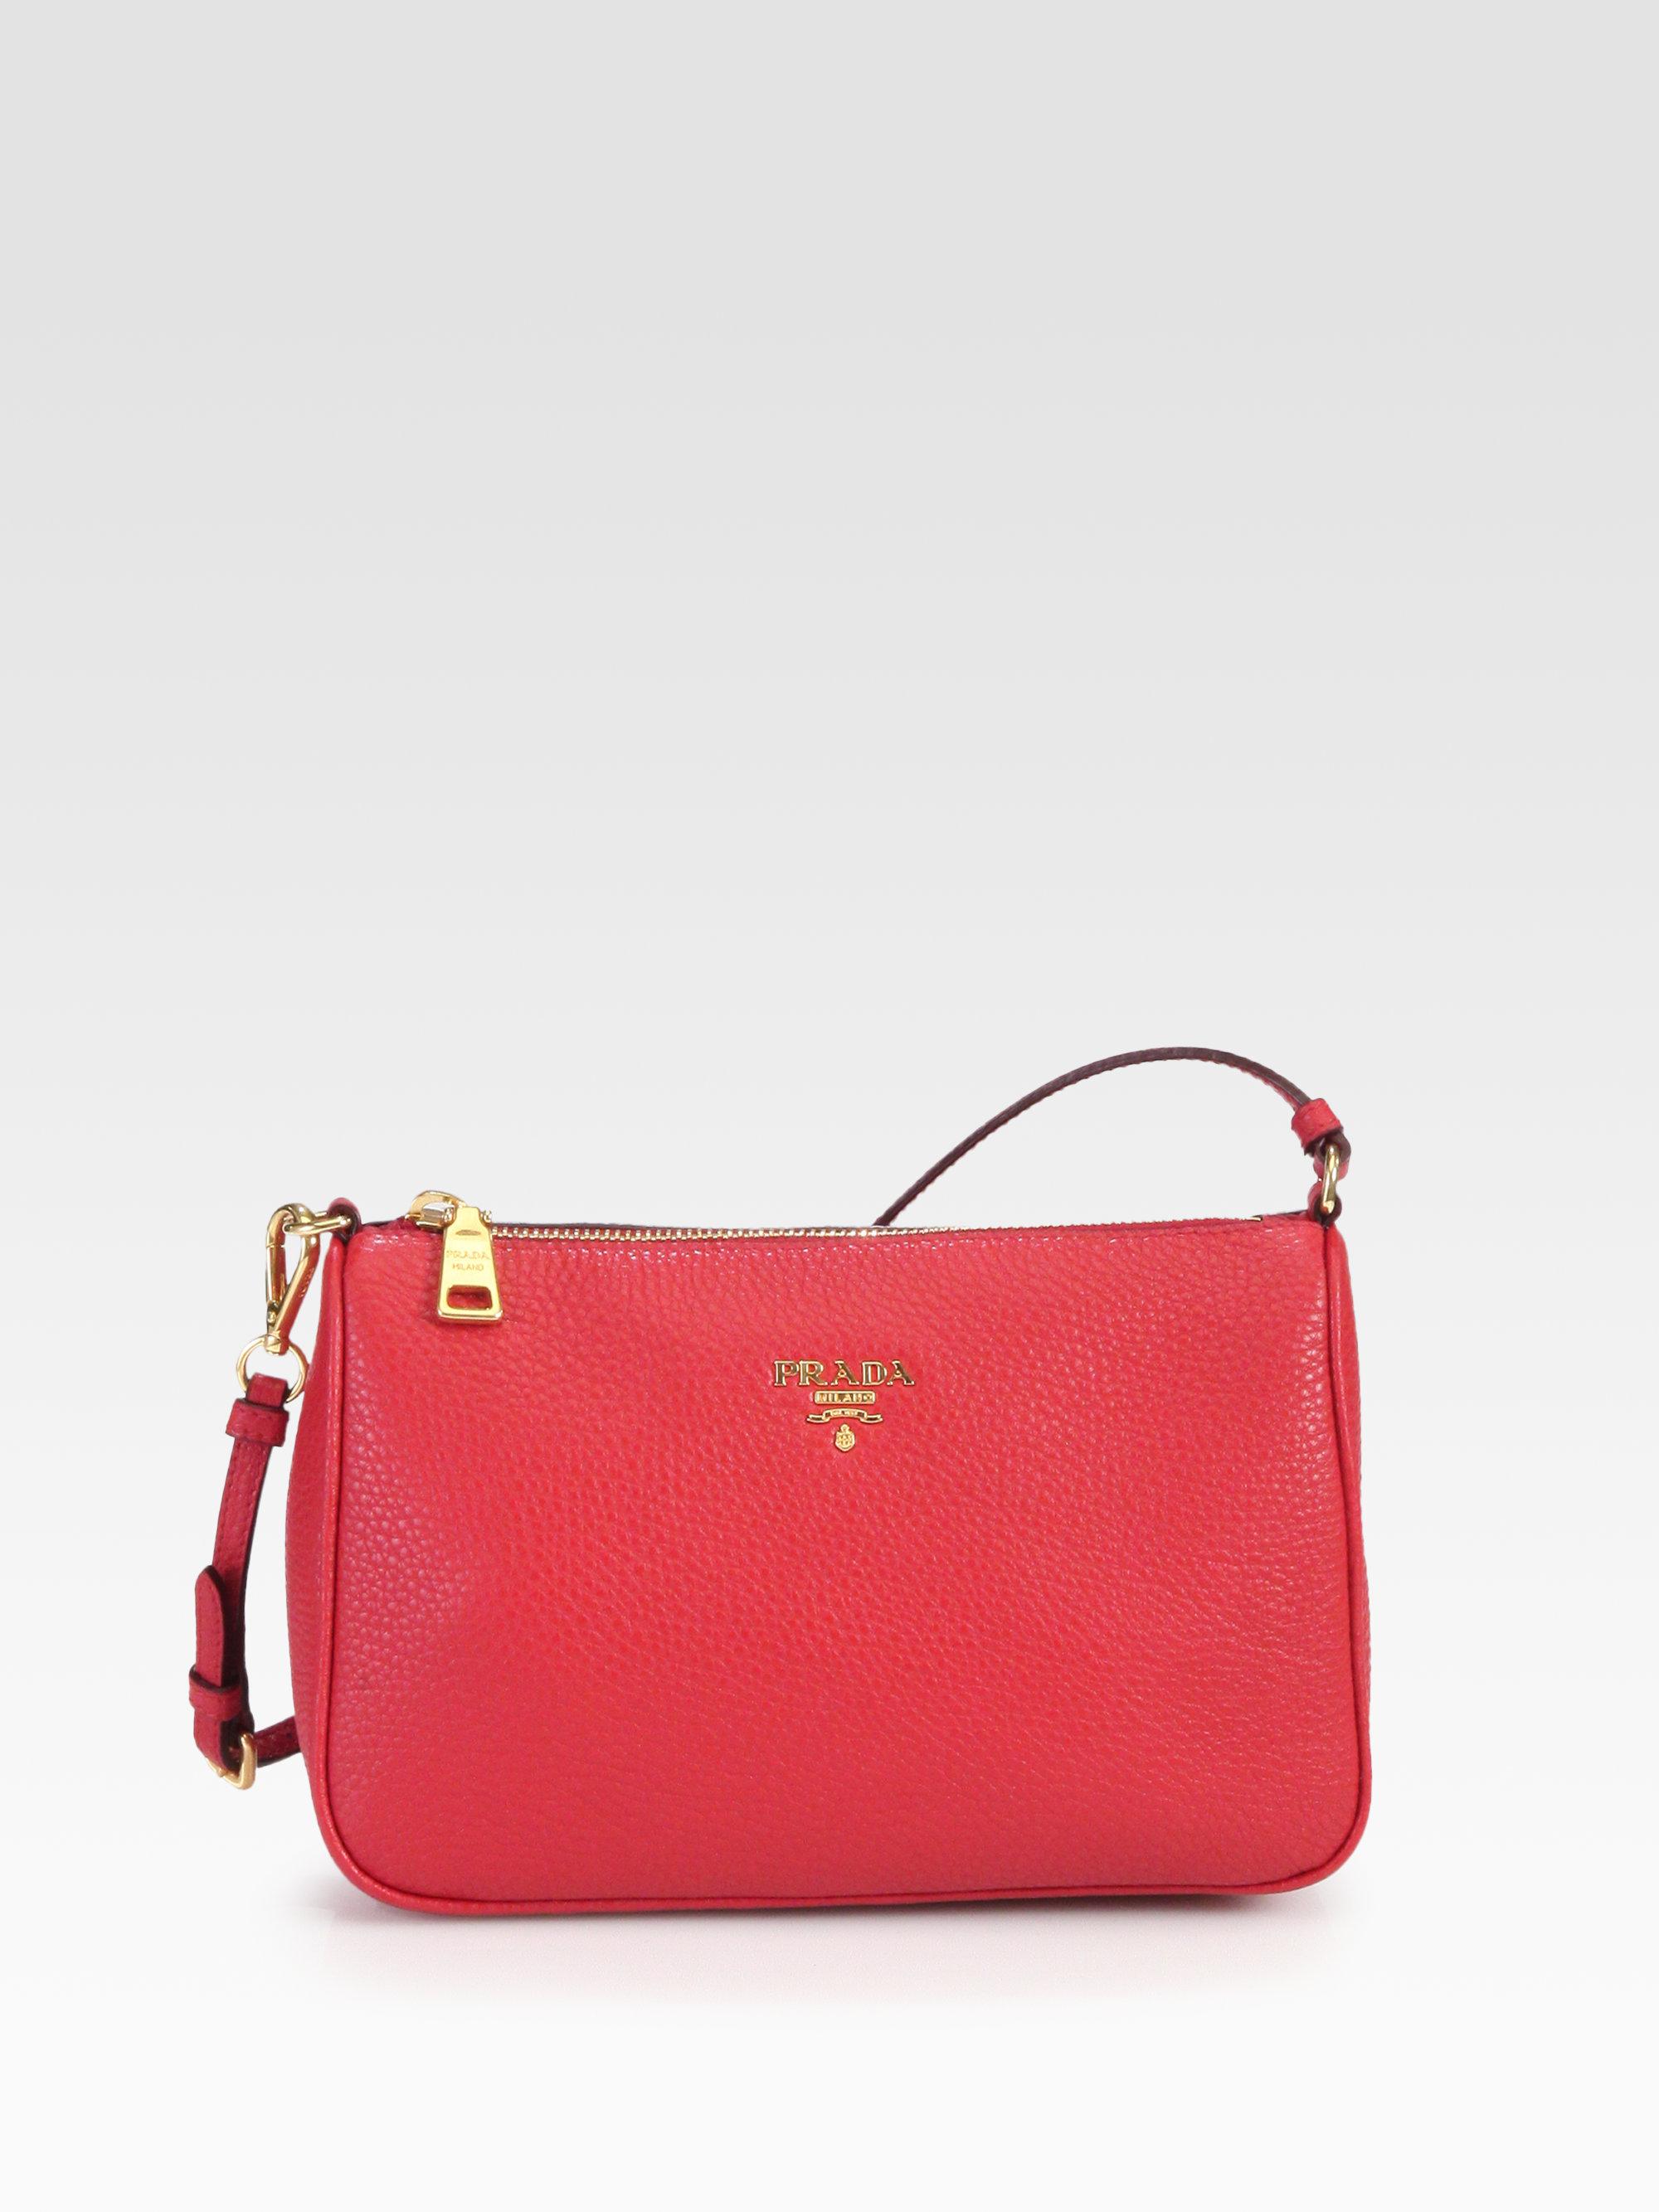 wholesale prada handbags authentic - Prada Daino Mini Hobo Bag in Red (rosso-red) | Lyst